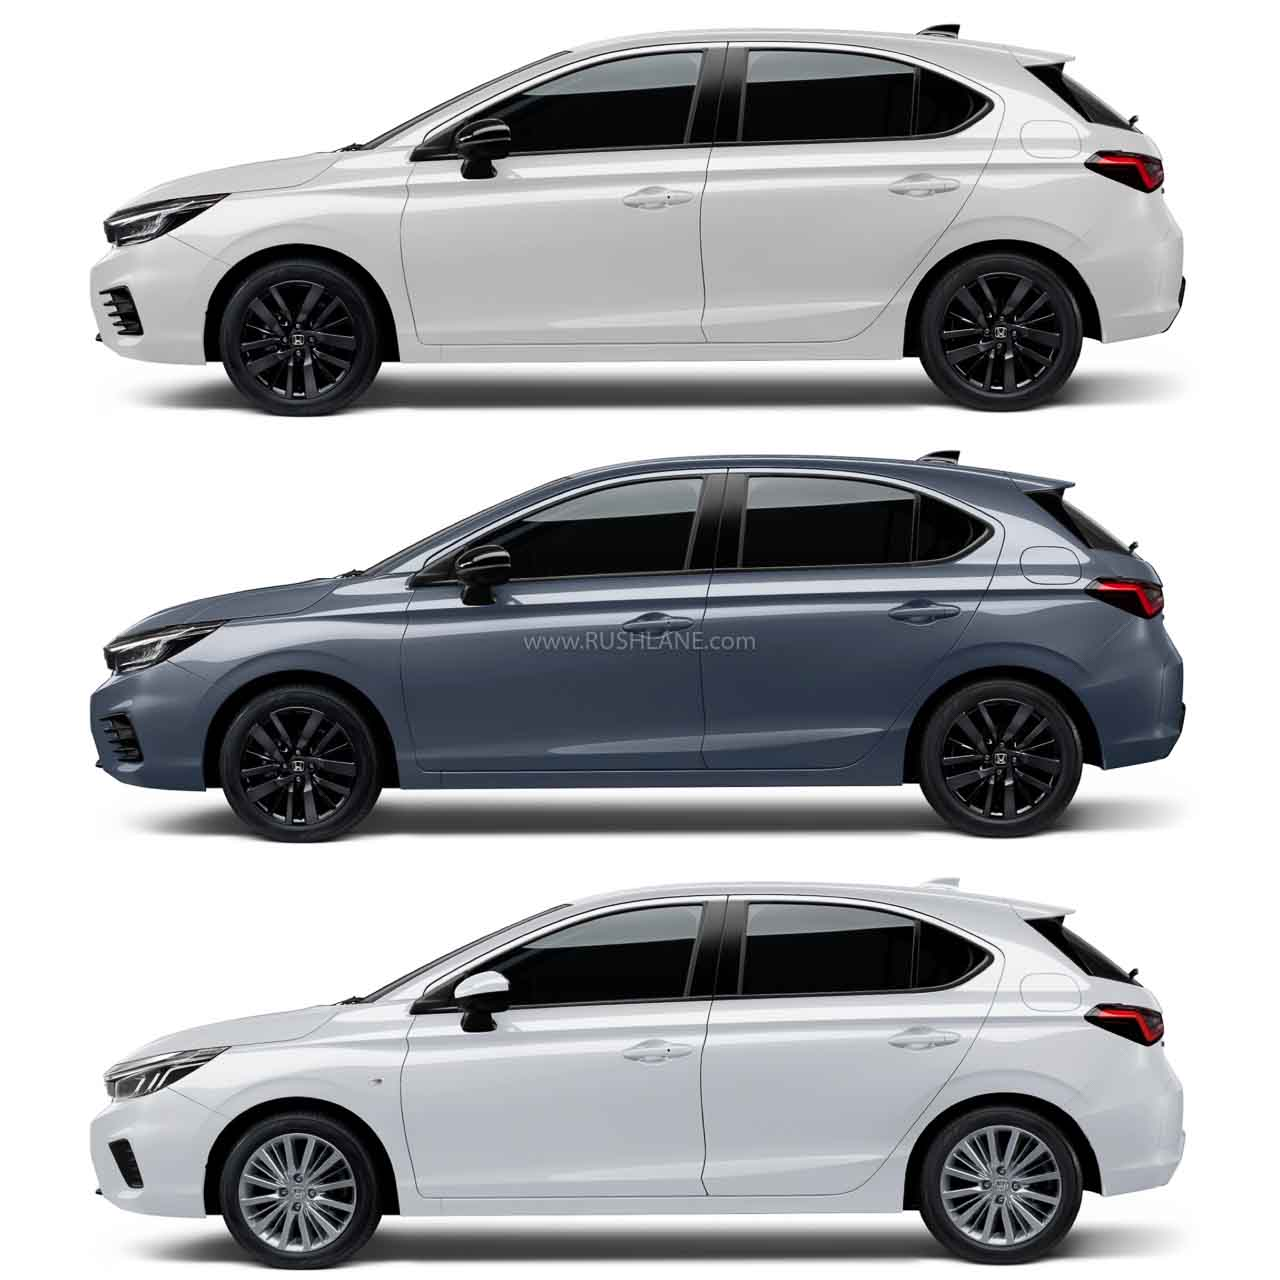 2021 Honda City Hatchback Launch Price THB 599k (Rs 14.6 Lakh)